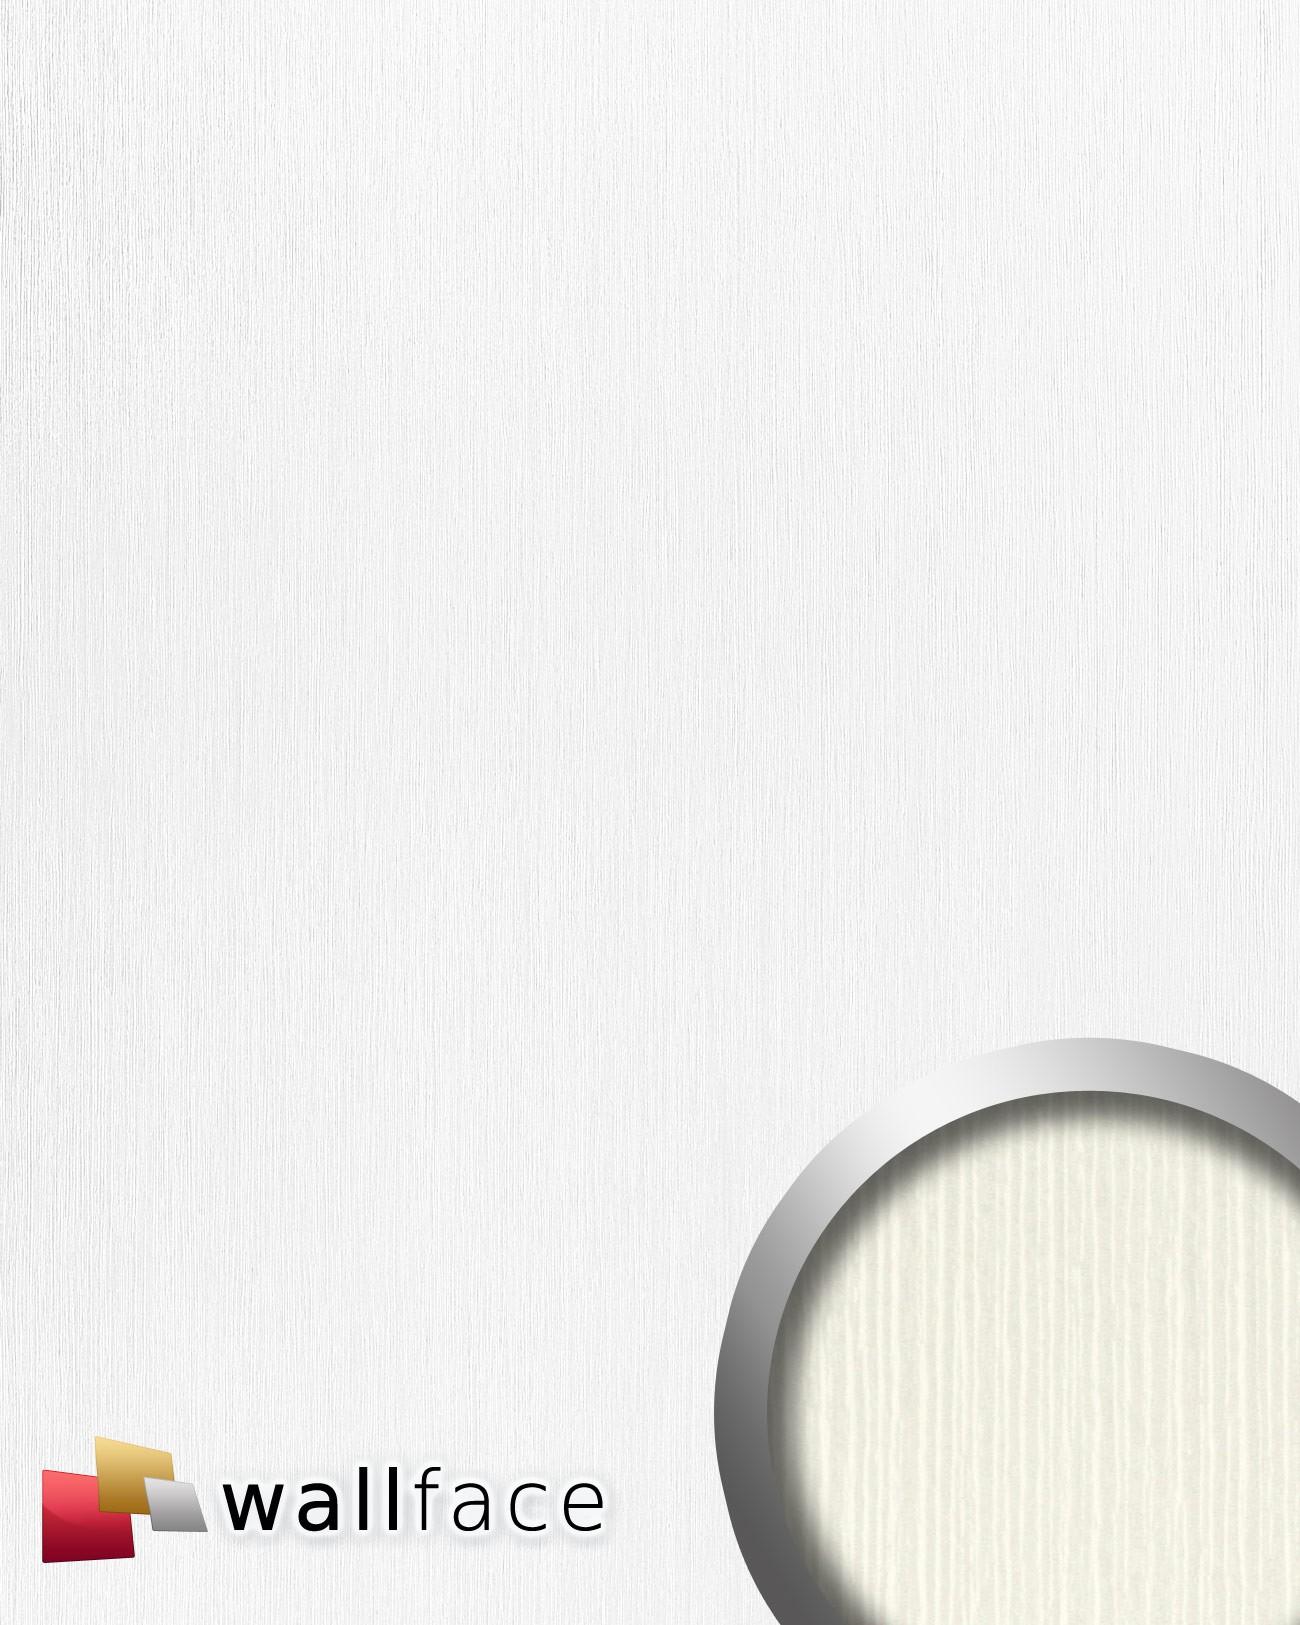 Panou Decorativ Acrylic 15770  Wallface  Autocolan